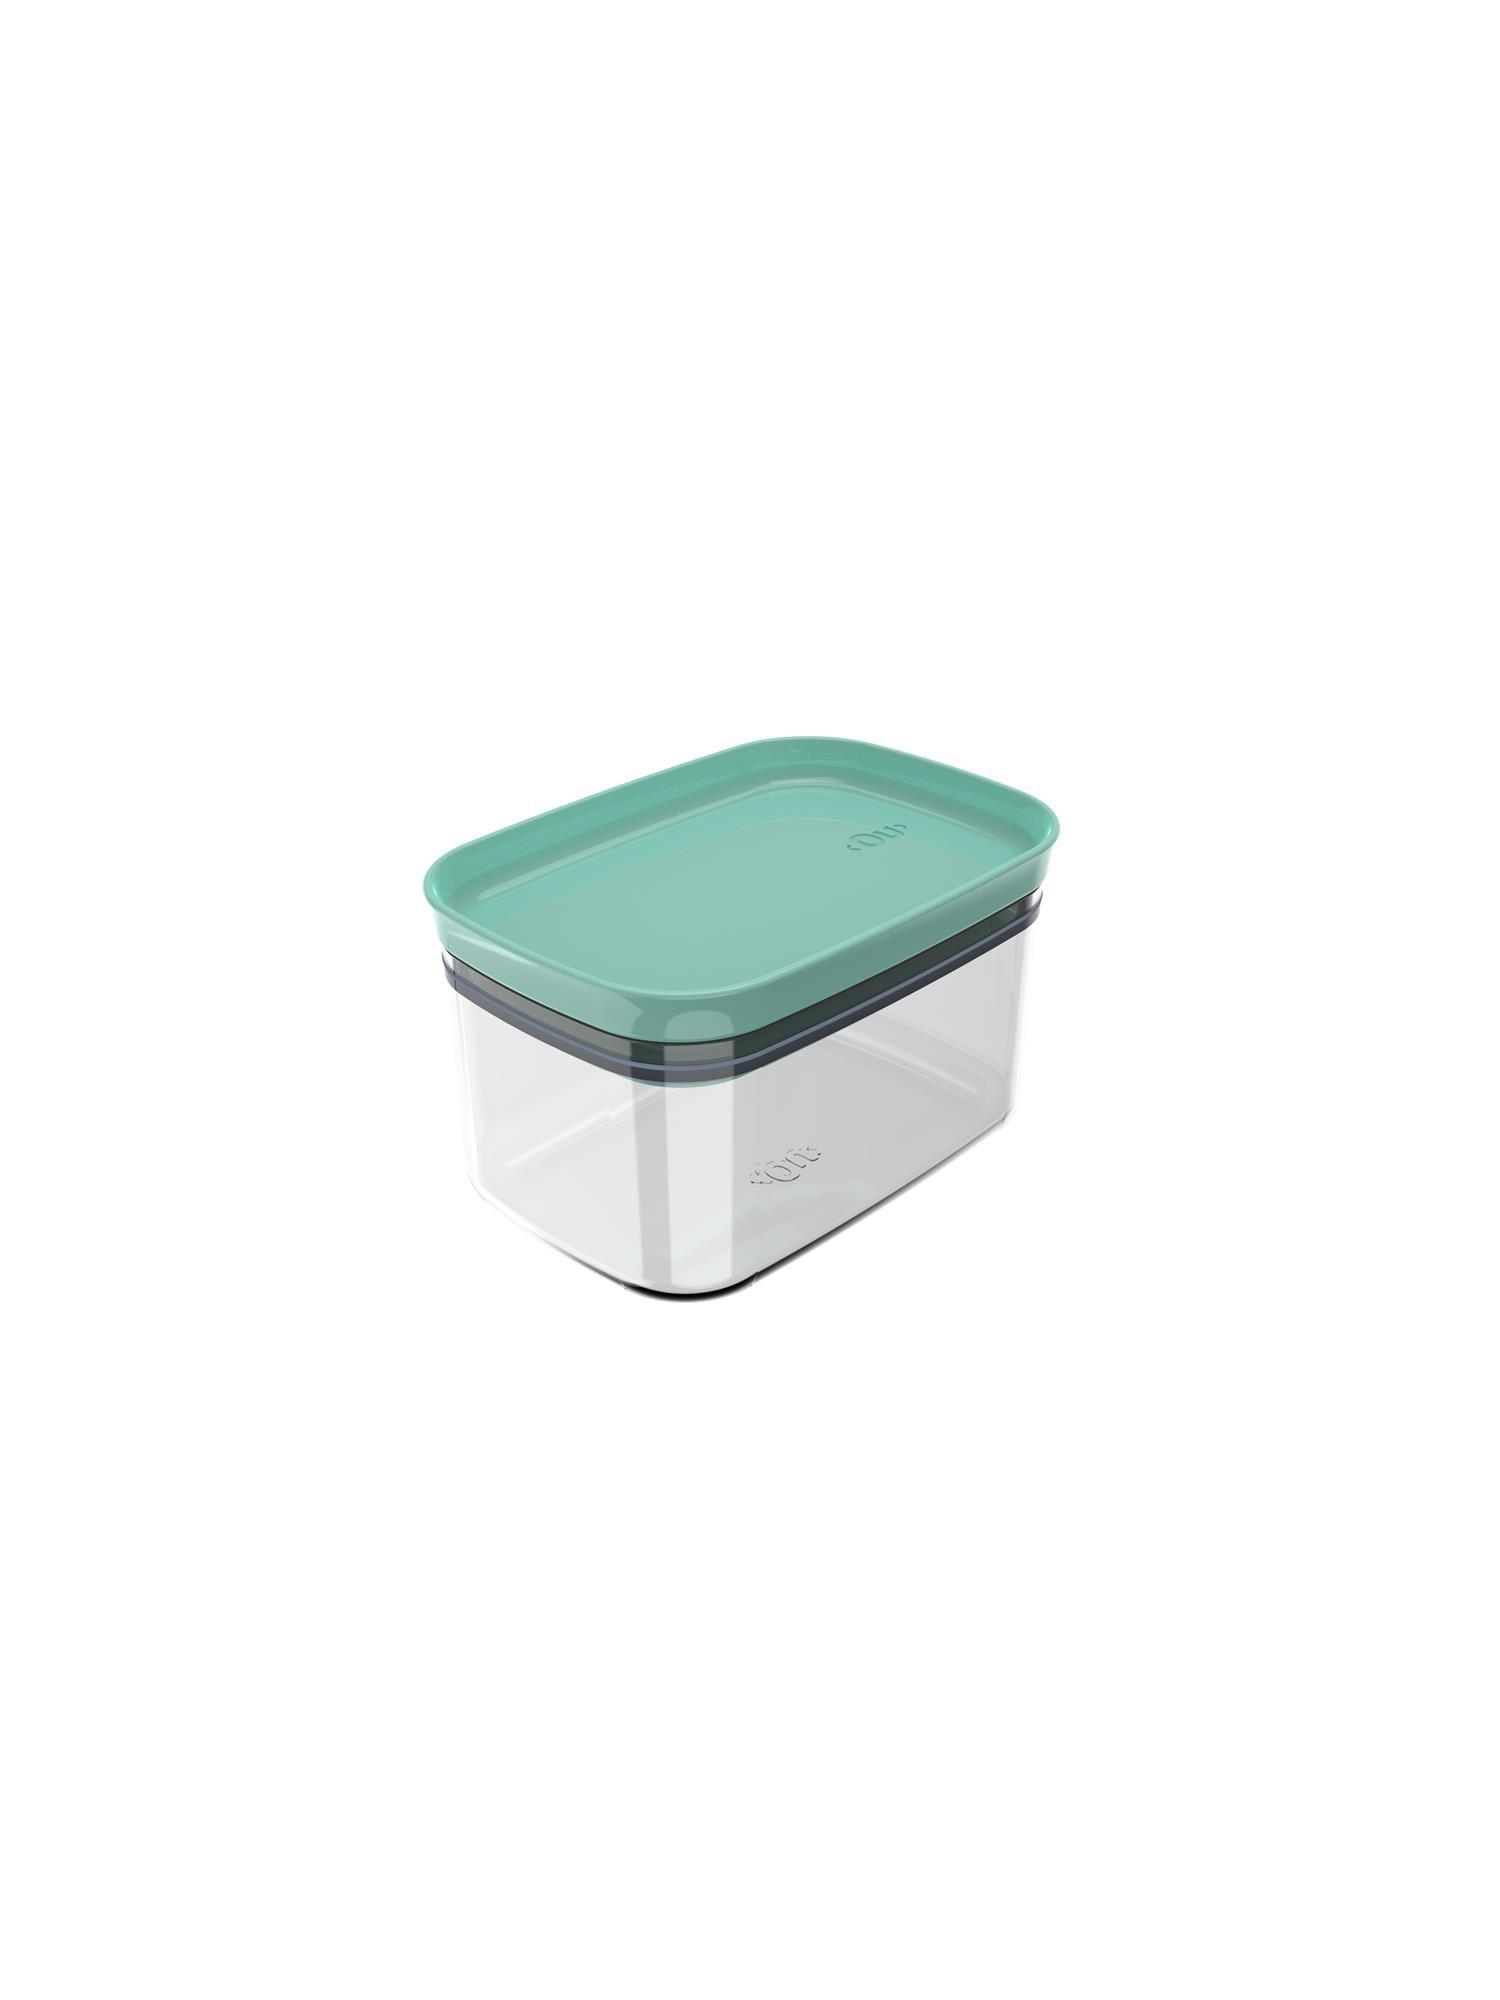 Pote Organizador Hermético Retangular Block 0,65L Verde Menta - Ou